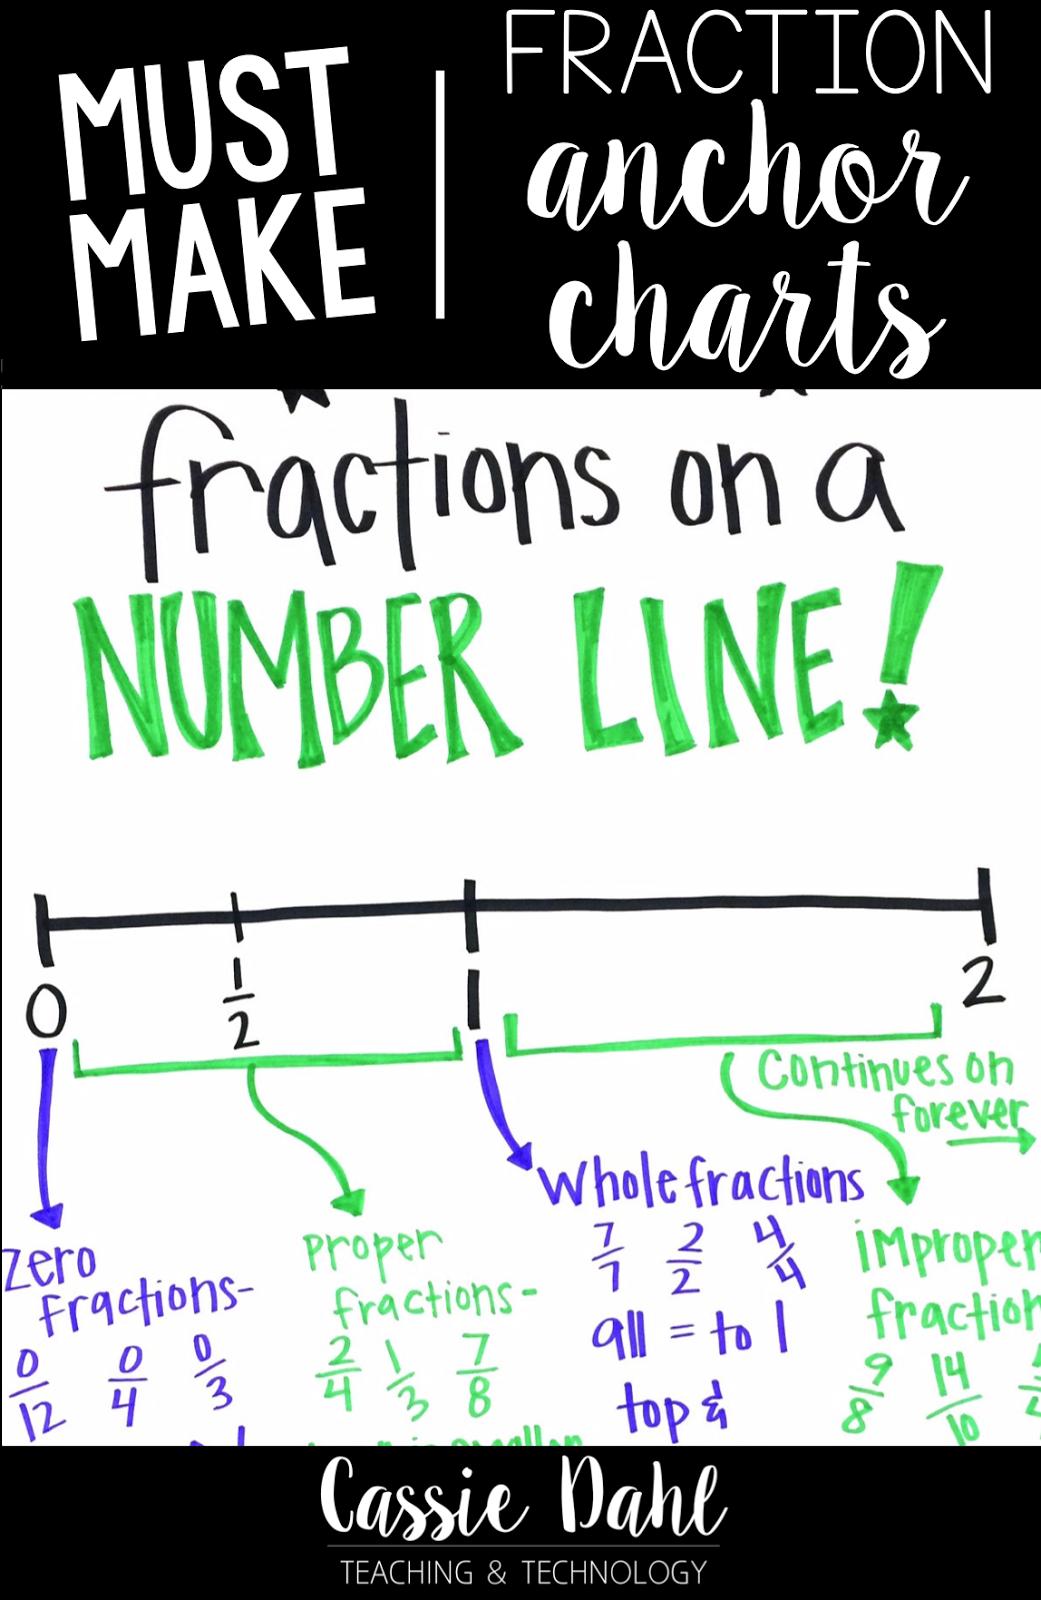 fraction anchor charts - cassie dahl: teaching & technology